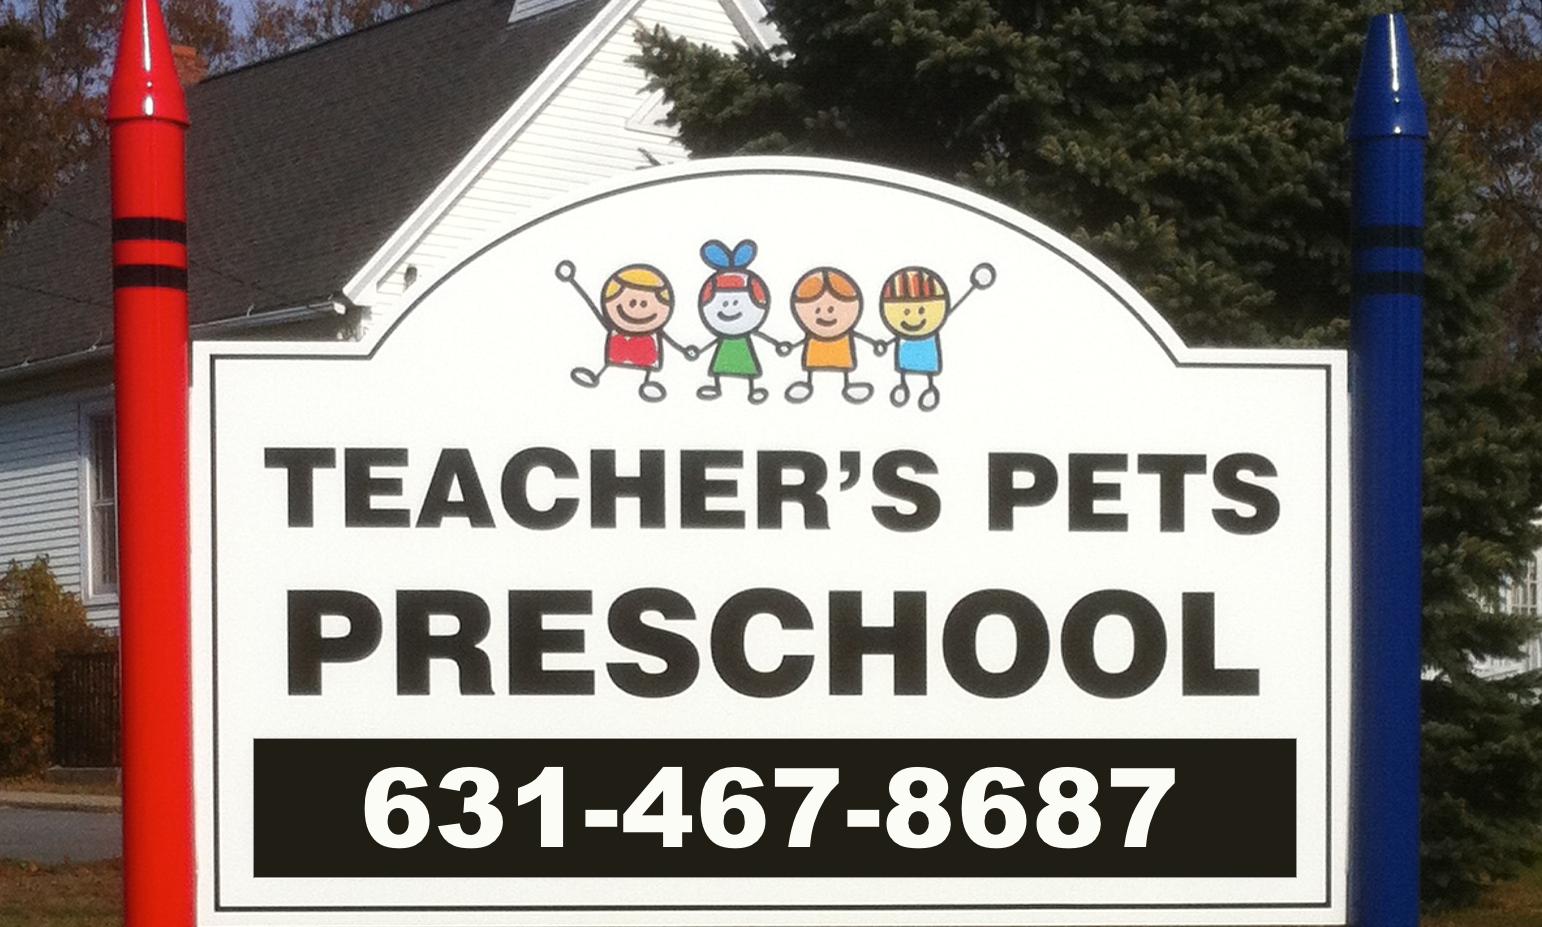 lake ronkonkoma preschool farmingville preschool teachers pets preschool official 347